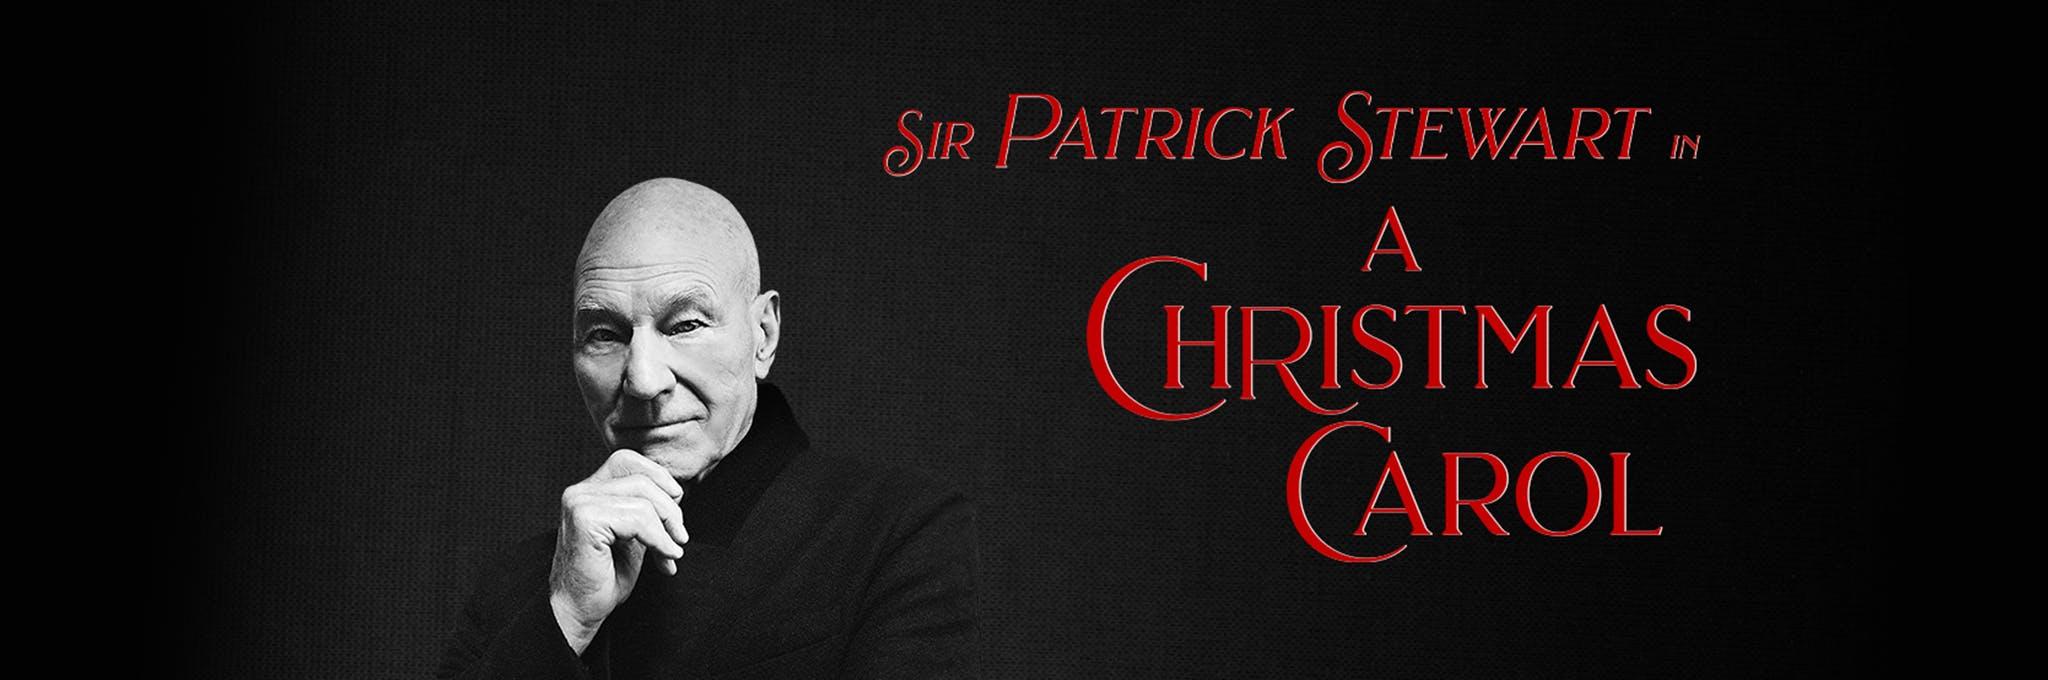 Sir Patrick Stewart in A Christmas Carol Logo